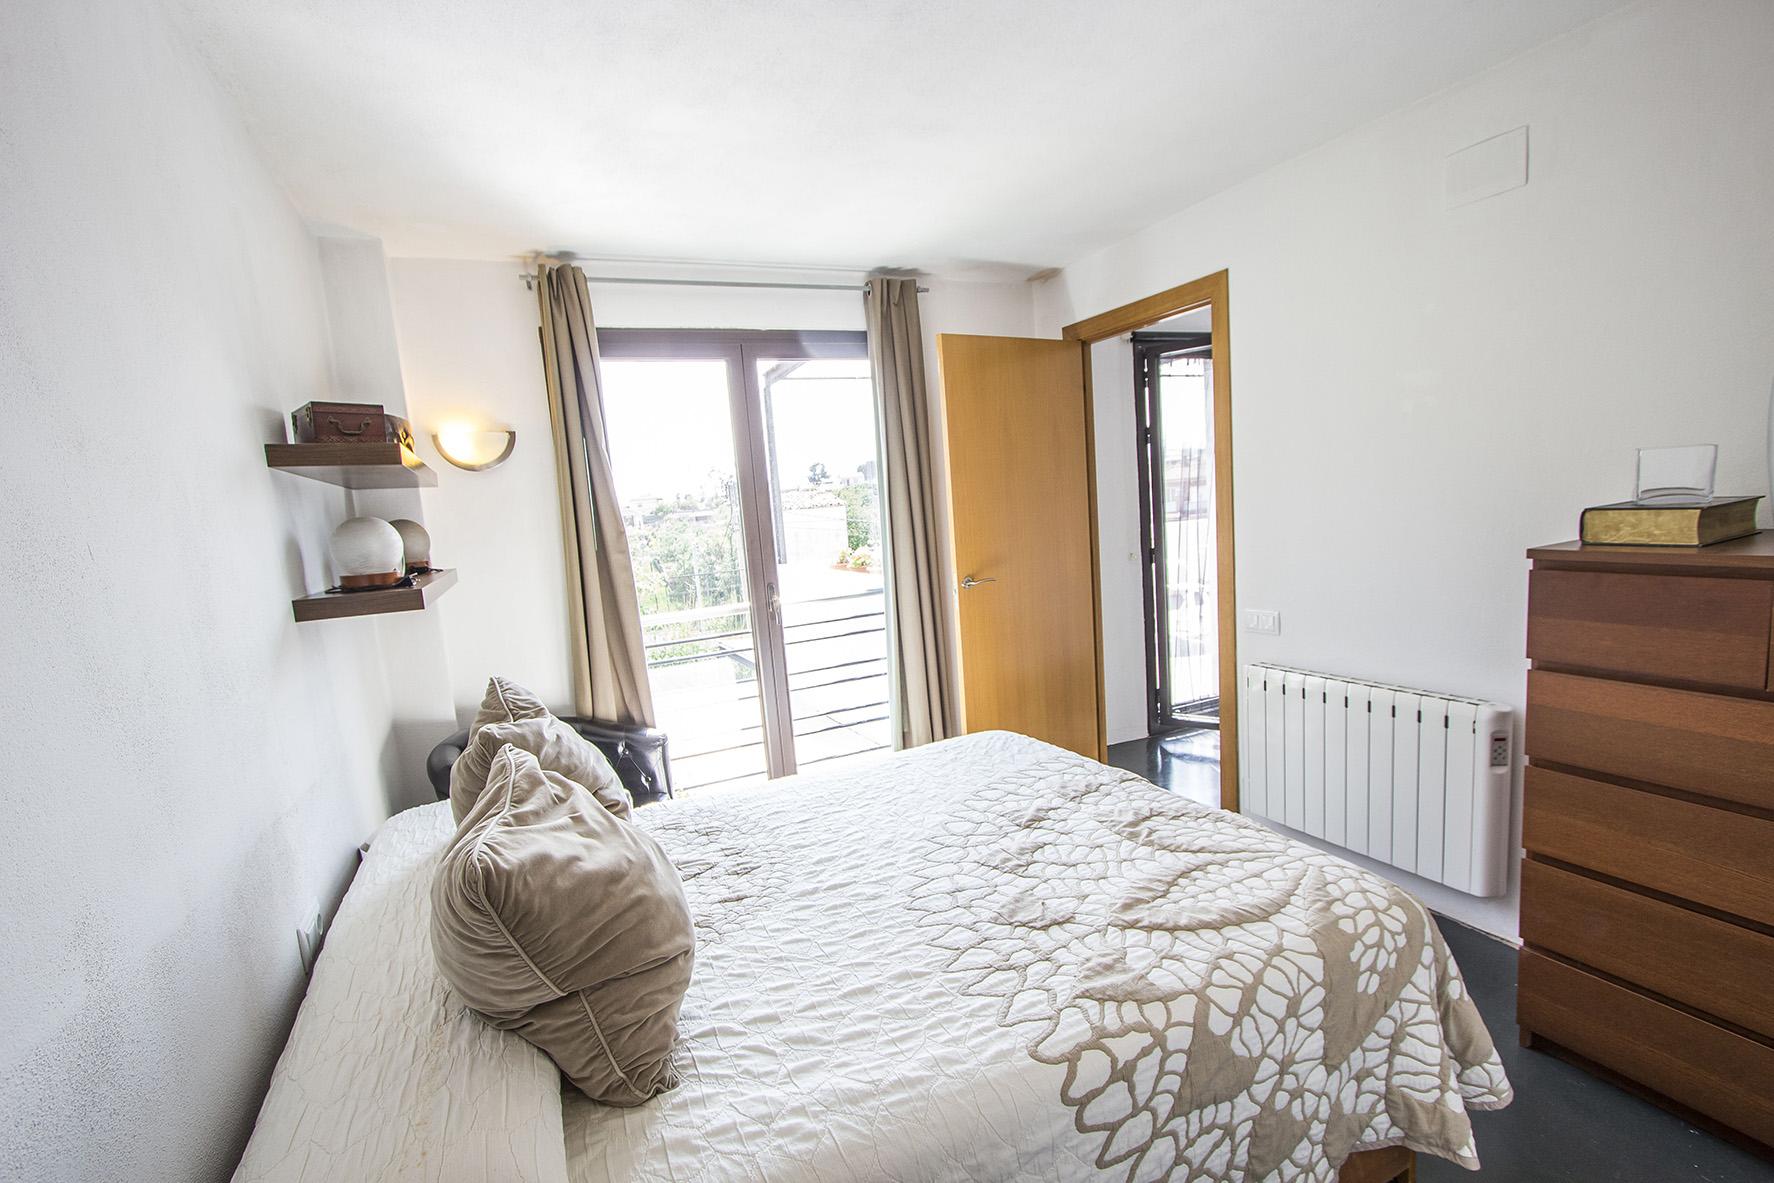 Ferienhaus Catalunya Casas: Serene villa in Sils, 20 km to Costa Brava beaches! (1890922), Les Mallorquines, Girona, Katalonien, Spanien, Bild 34